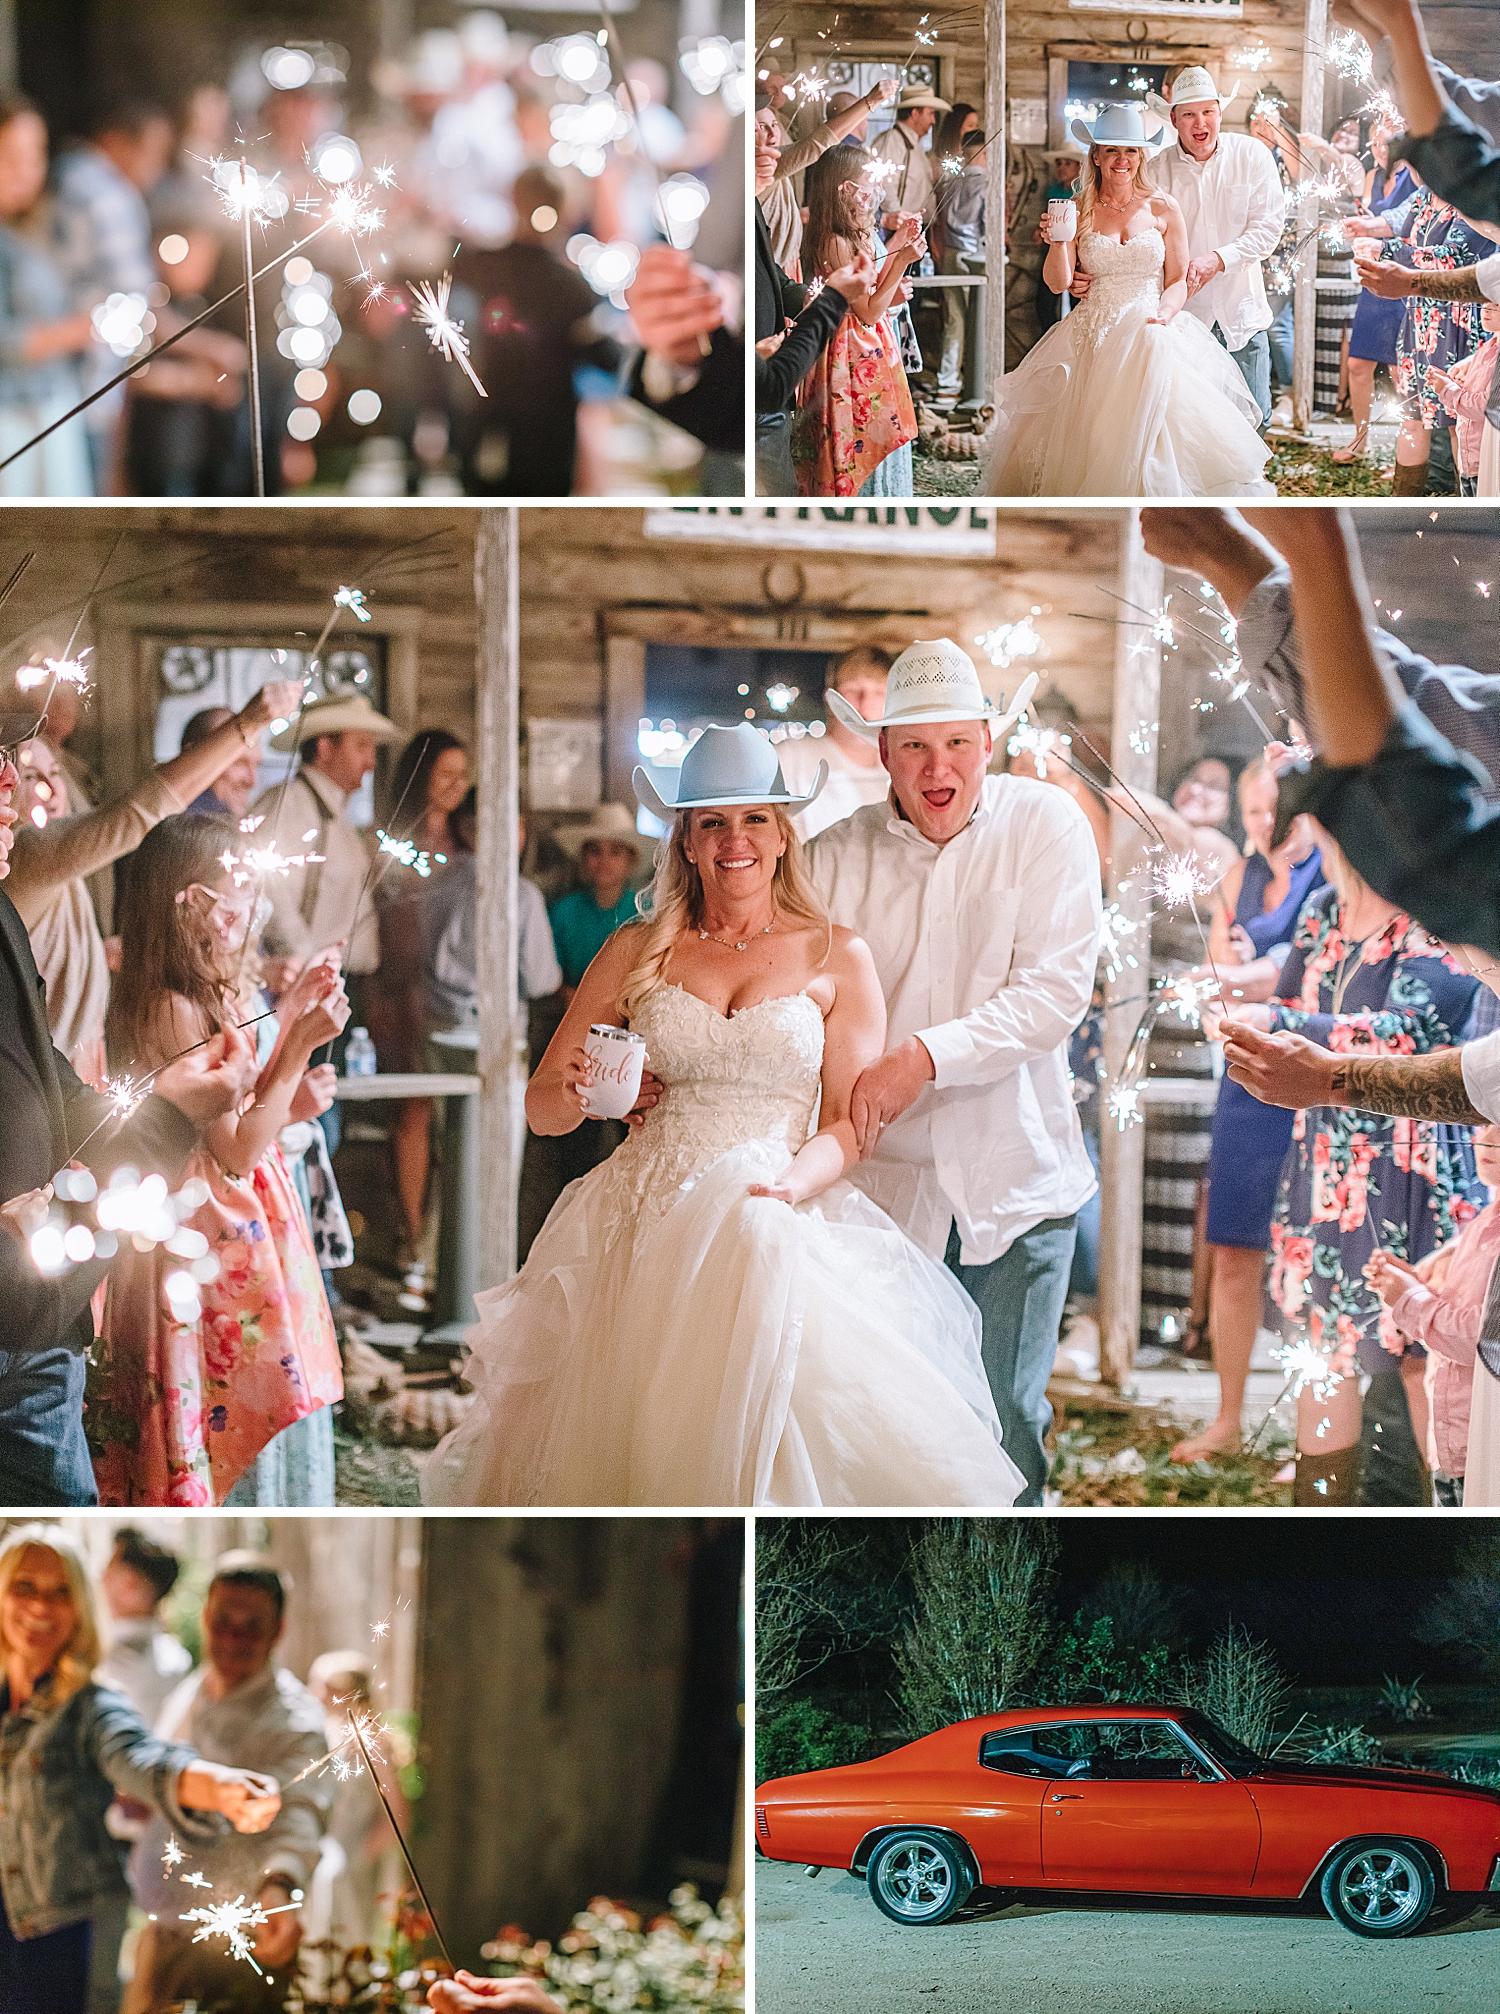 Rio-Cibilo-Ranch-Marion-Texas-Wedding-Rustic-Blush-Rose-Quartz-Details-Carly-Barton-Photography_0082.jpg